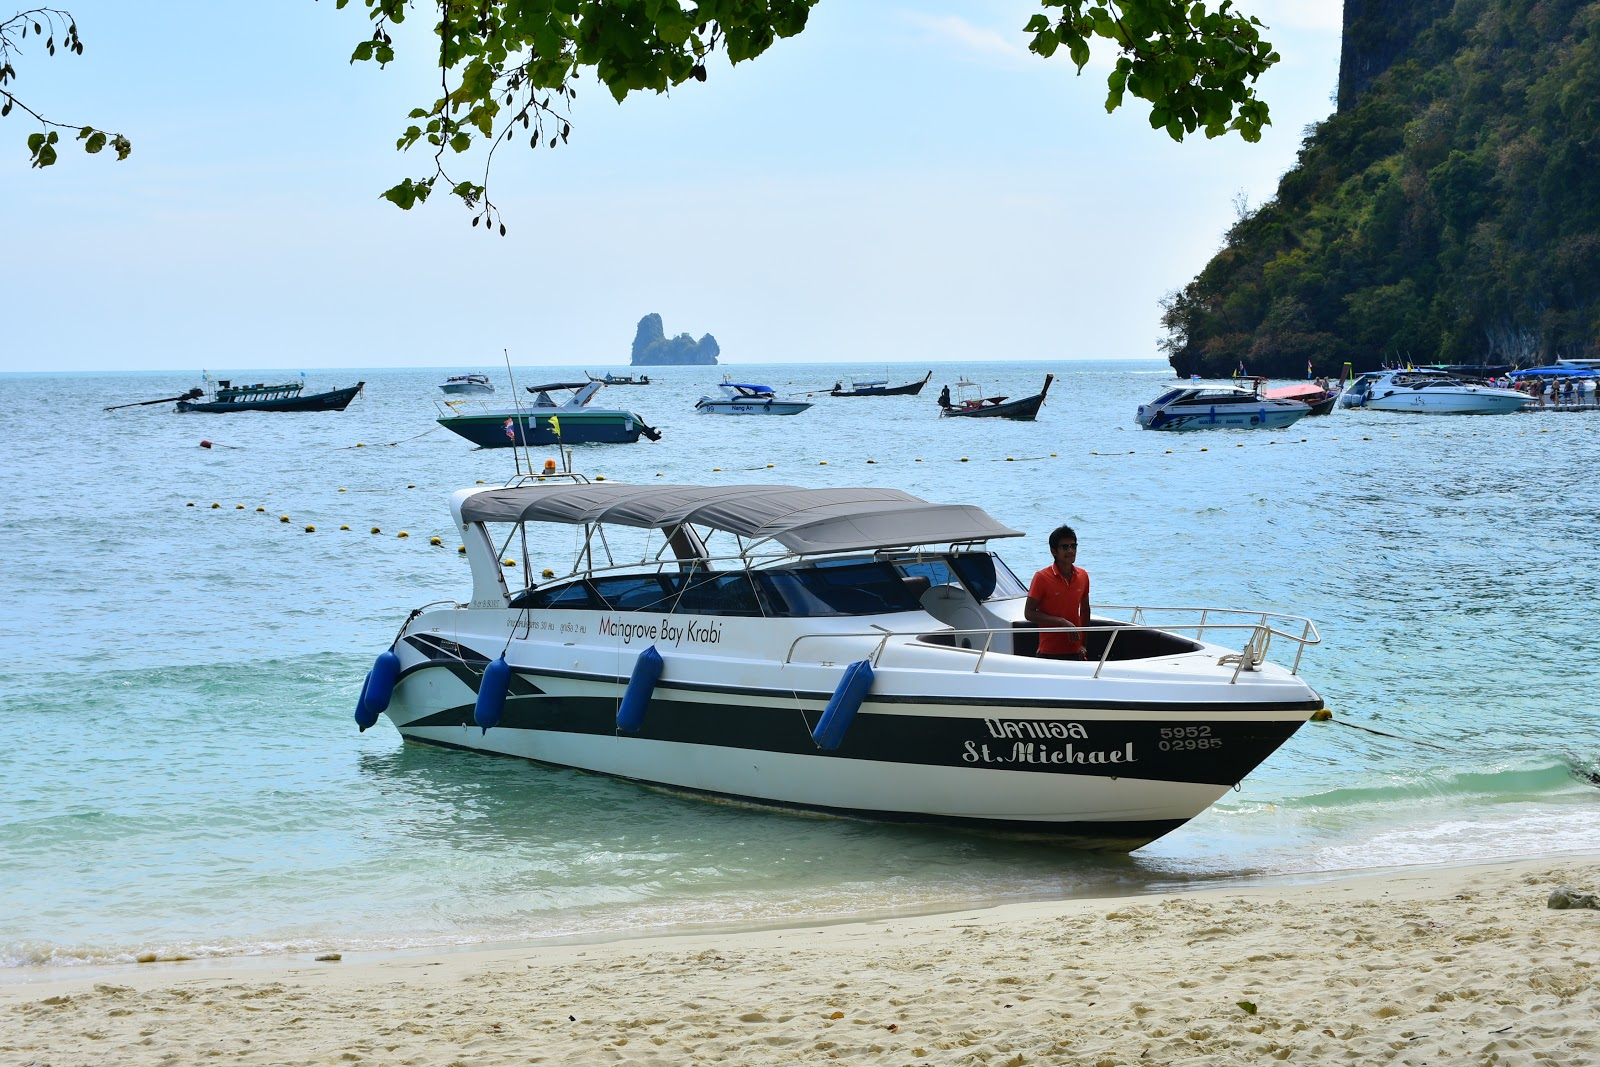 The Hong Islands Day Trip by Mangrove Bay Krabi